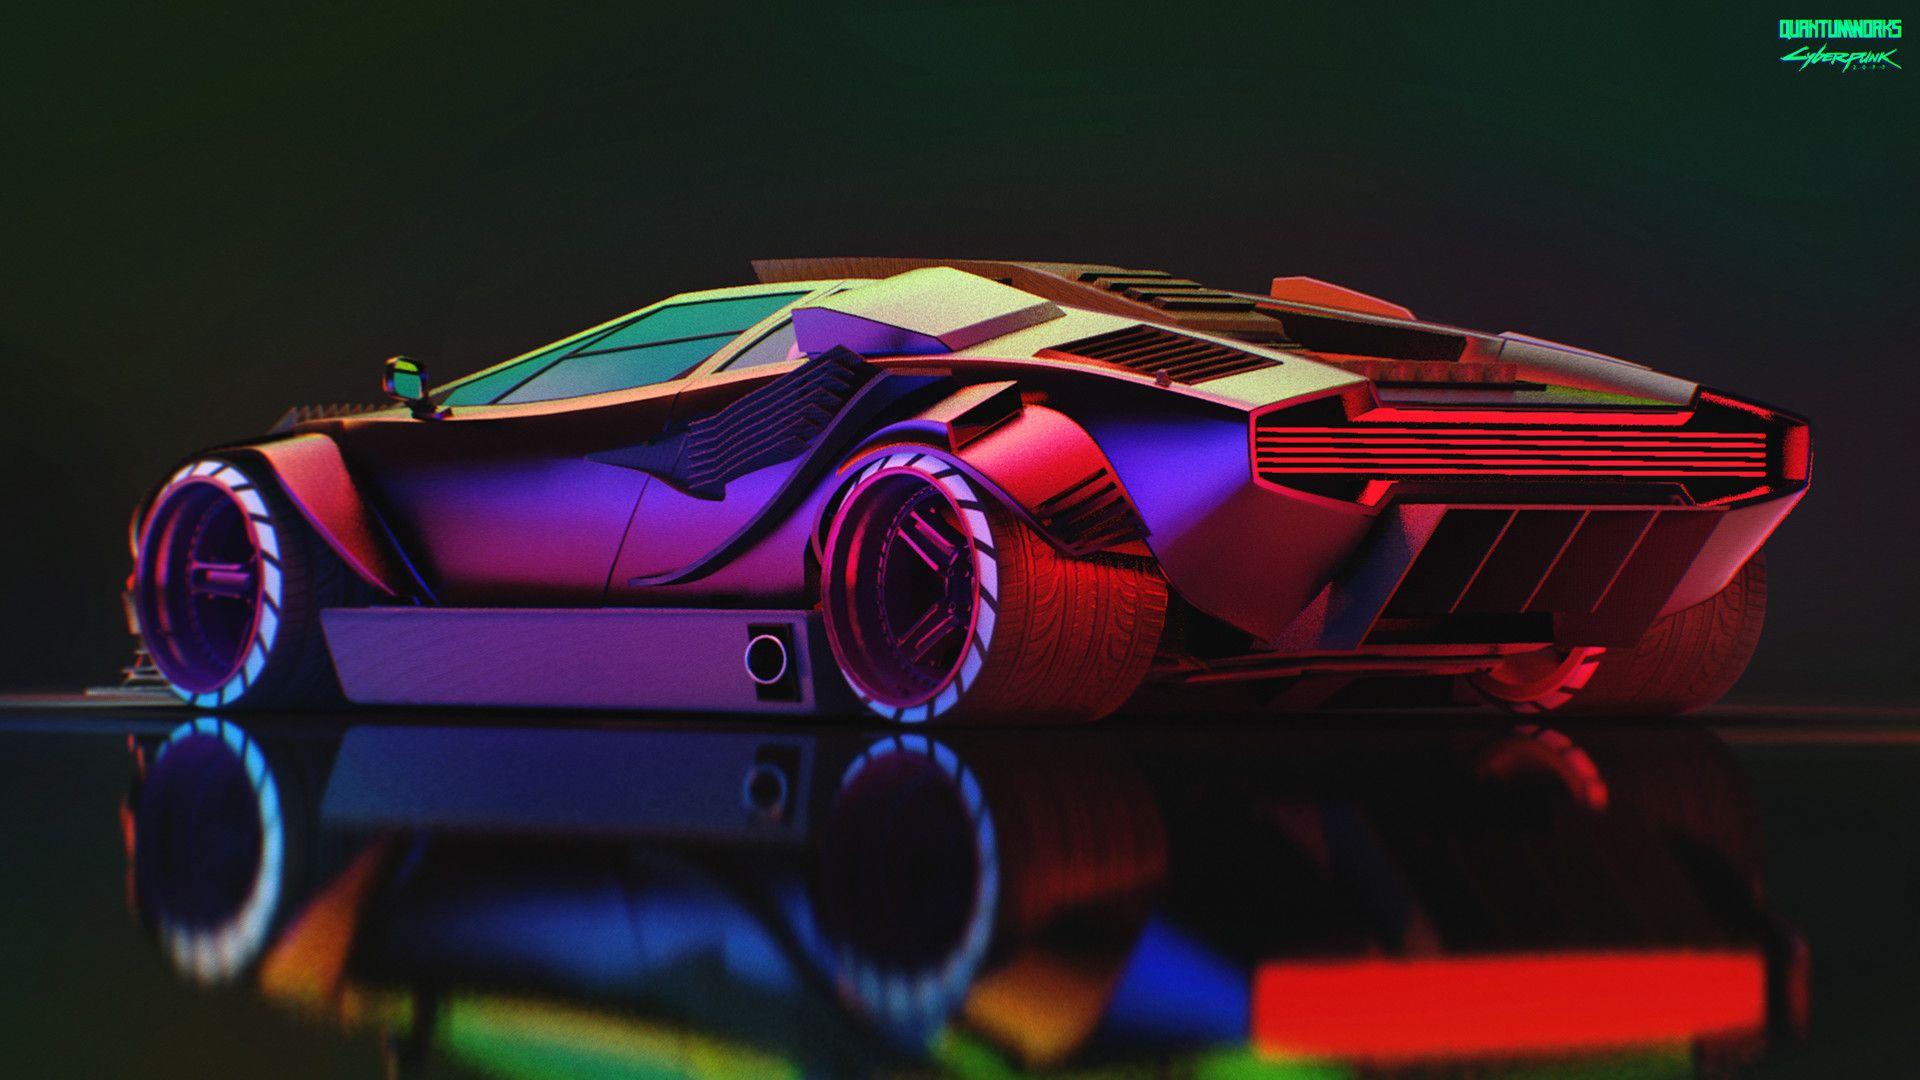 Cyberpunk 2077 Cyberpunk 2077 Cyberpunk Supercars Wallpaper